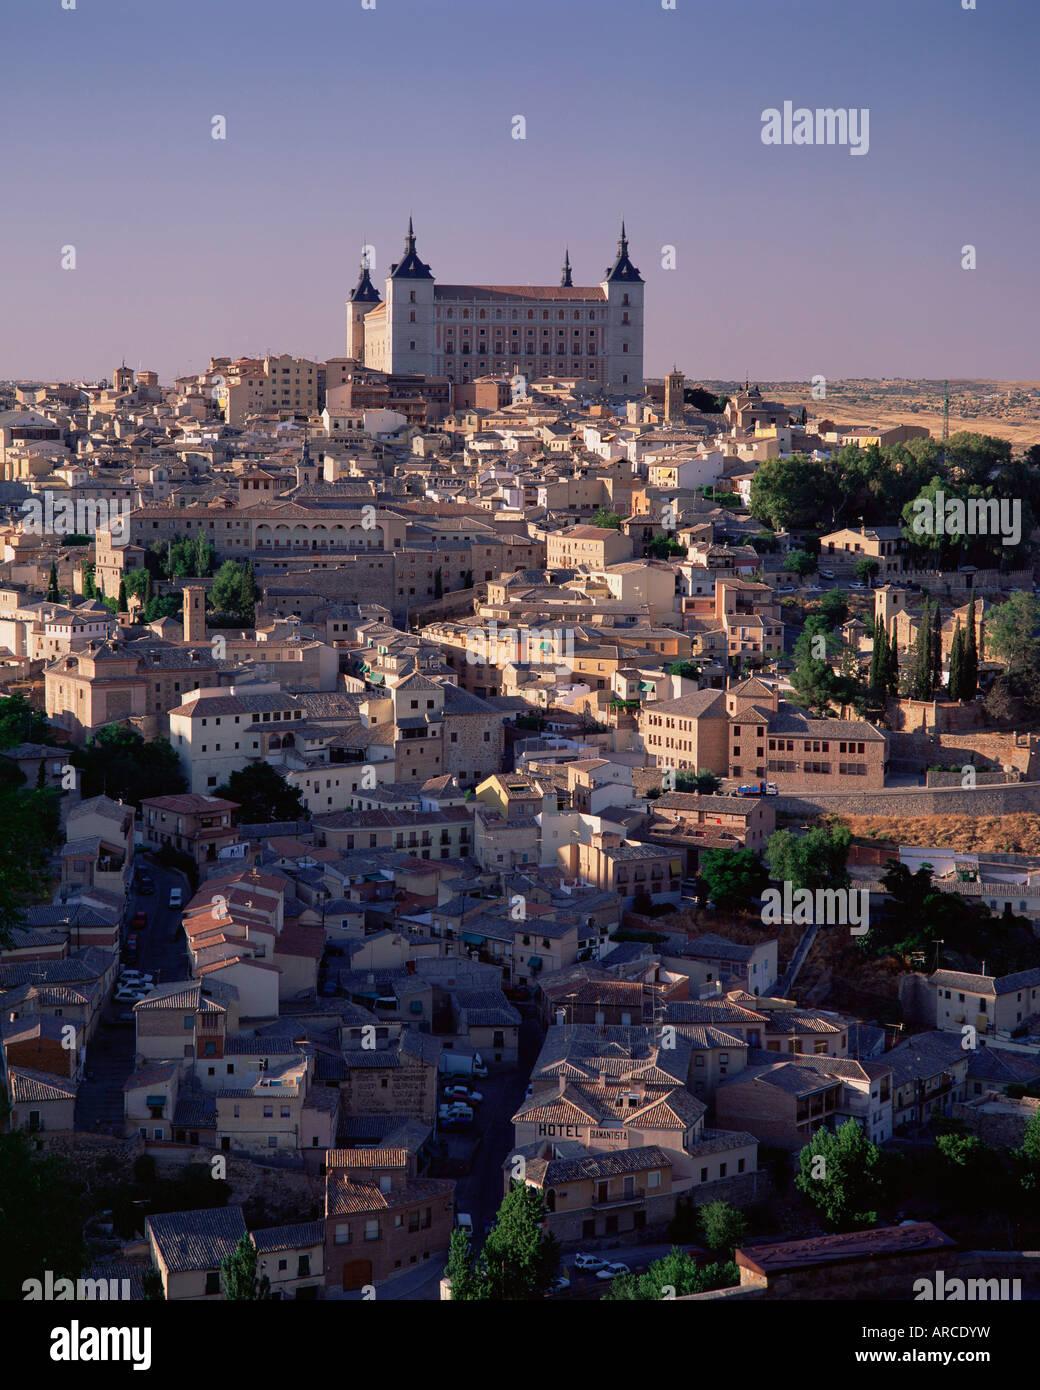 The Alcazar towering above the city, Toledo, Castilla-La Mancha, Spain, Europe - Stock Image